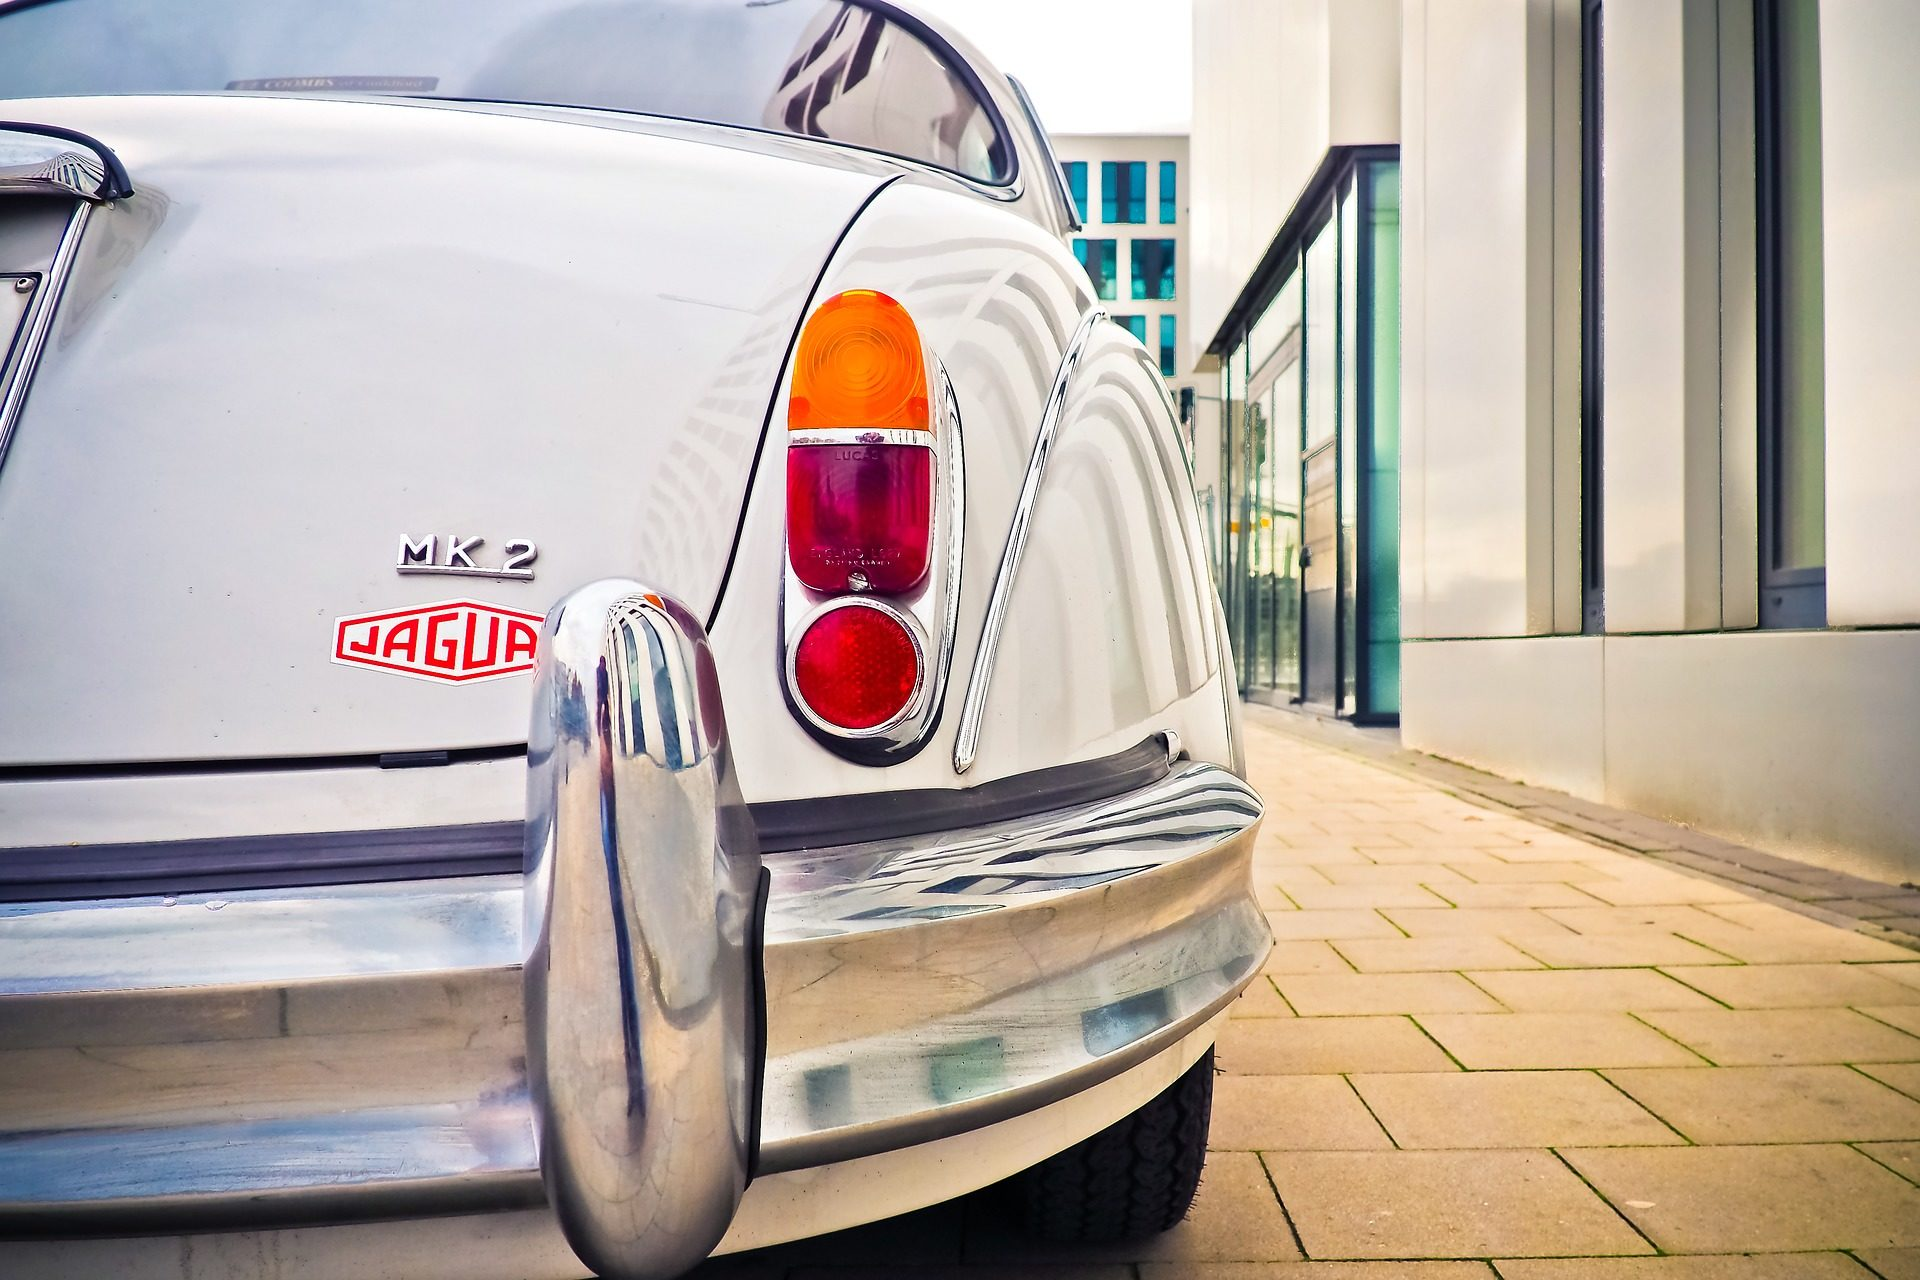 auto, vecchio, Classic, vintage, Jaguar, paraurti - Sfondi HD - Professor-falken.com